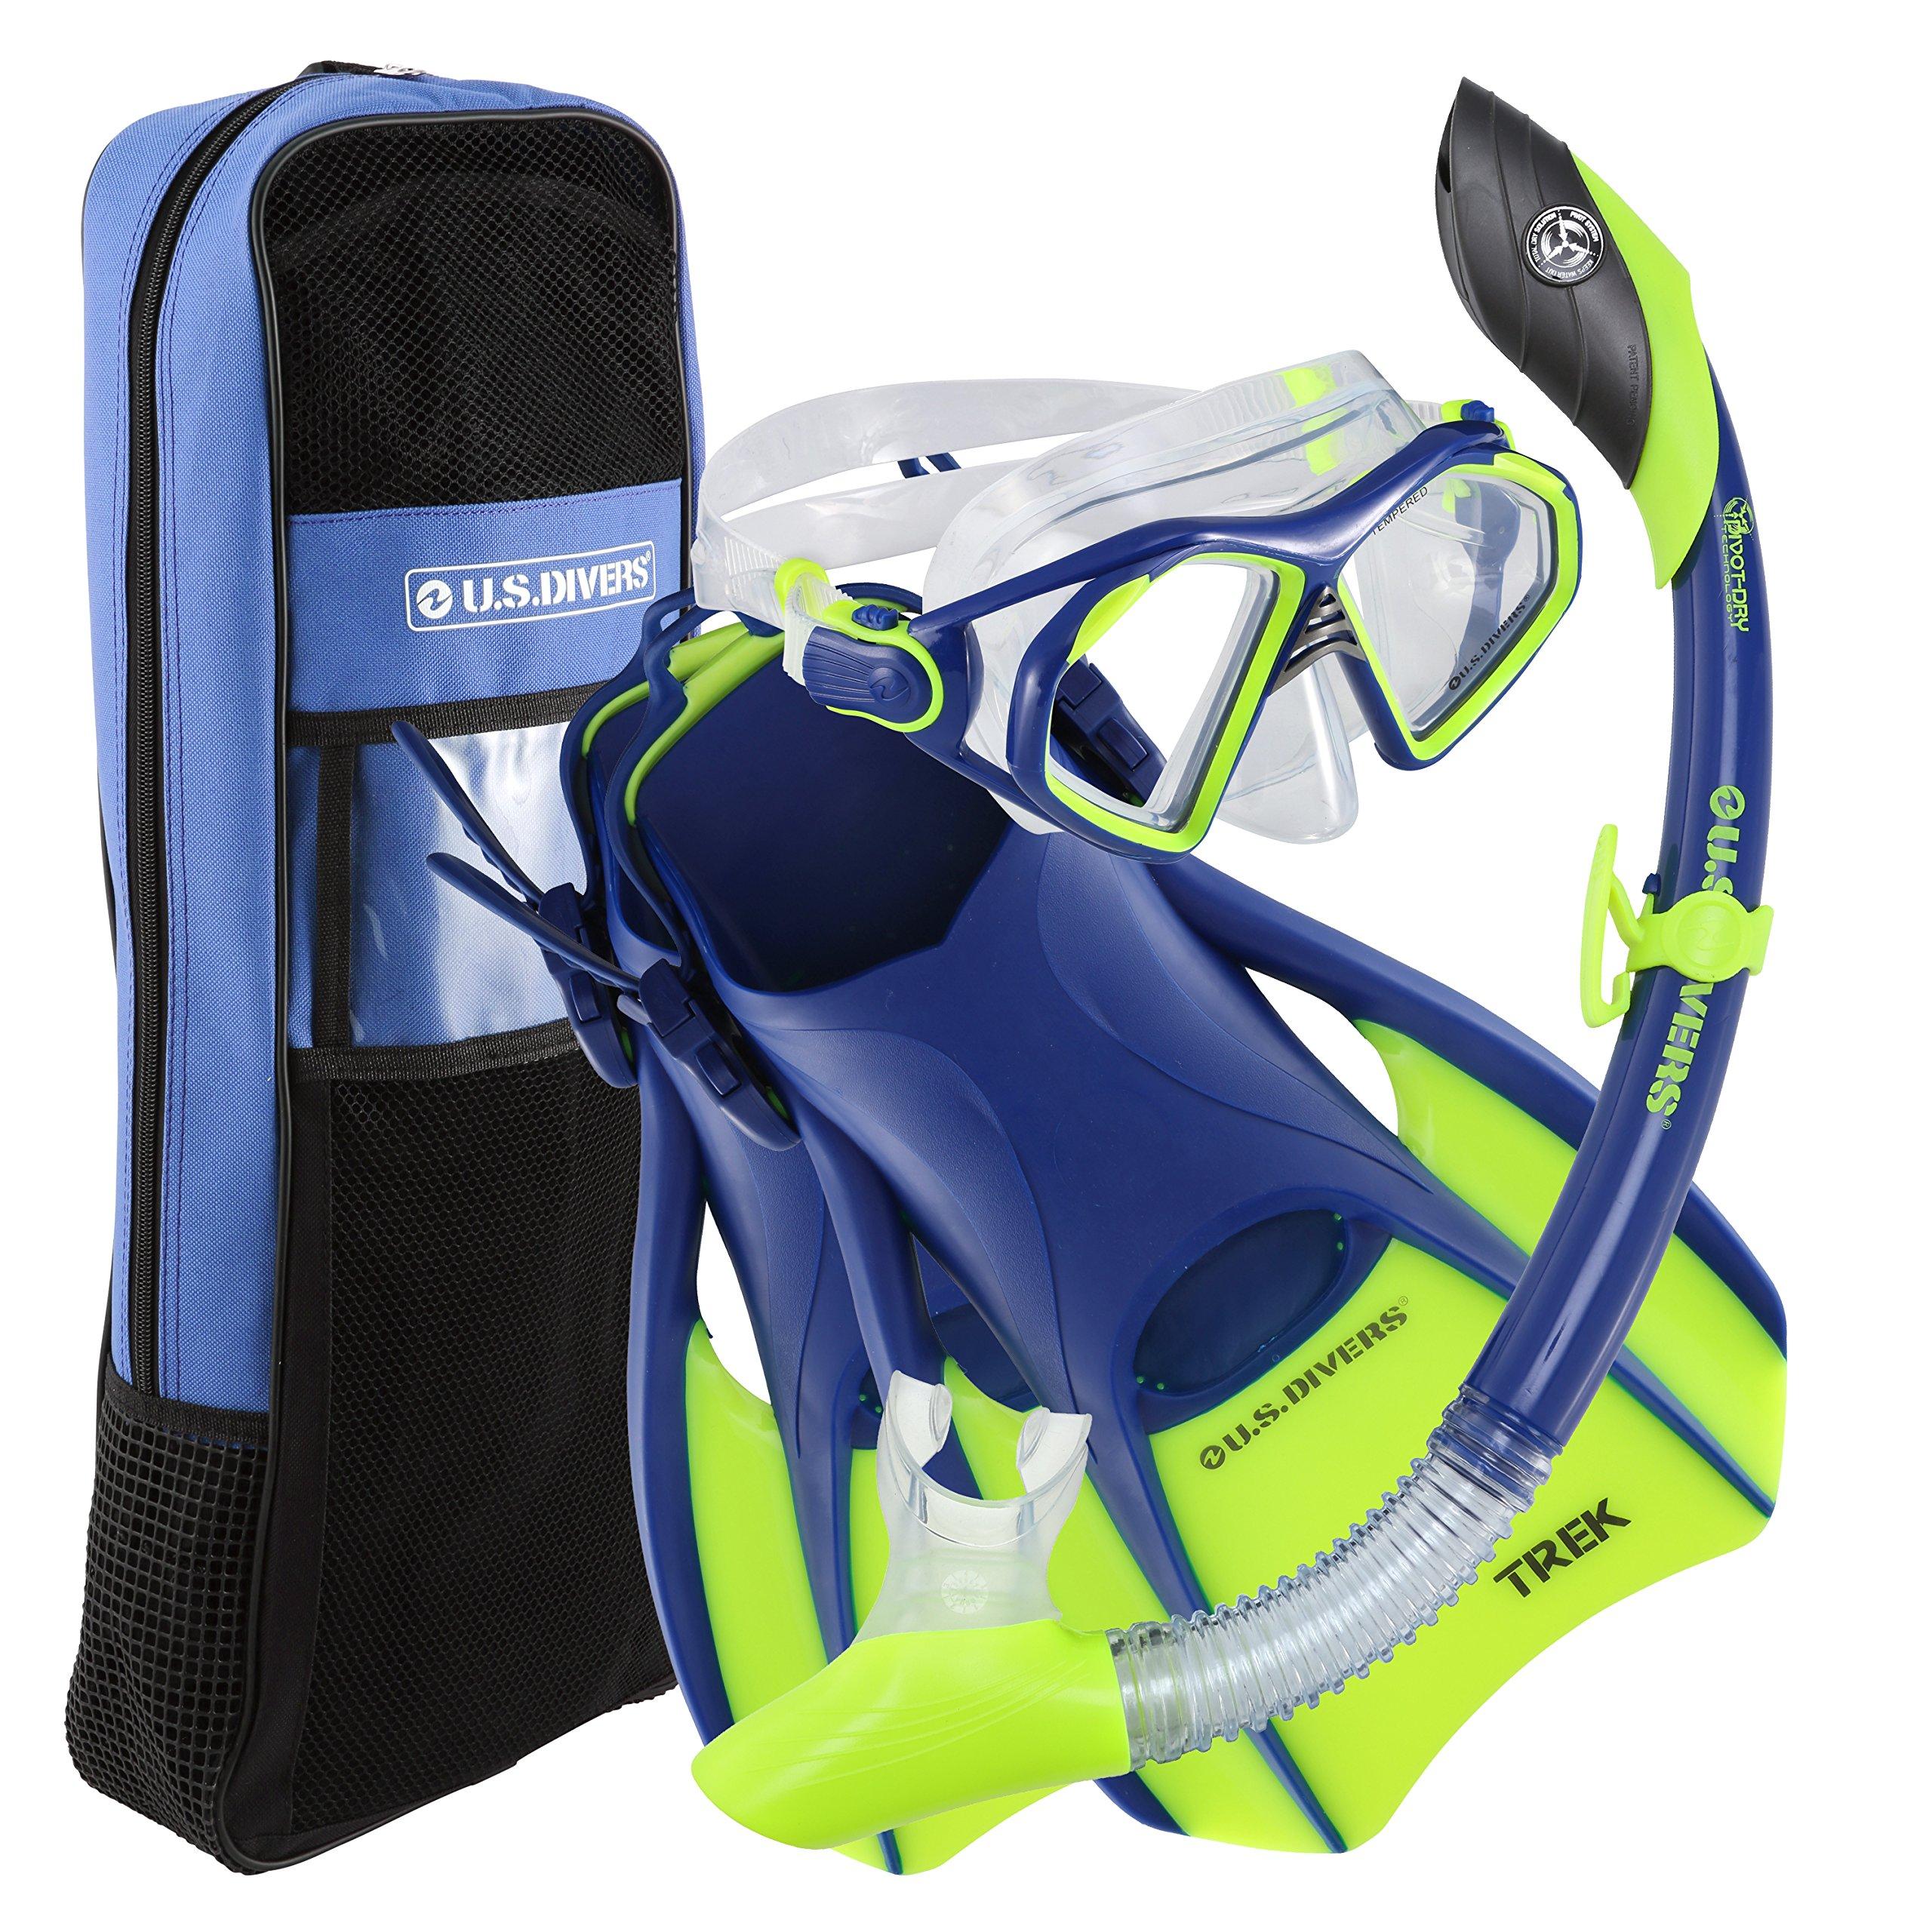 U.S. Divers Admiral Snorkeling Set - Premium Silicone Snorkel Mask, Trek Travel Fins, Dry Top Snorkel + Snorkeling Gear Bag, Neon Blue, Medium by U.S. Divers